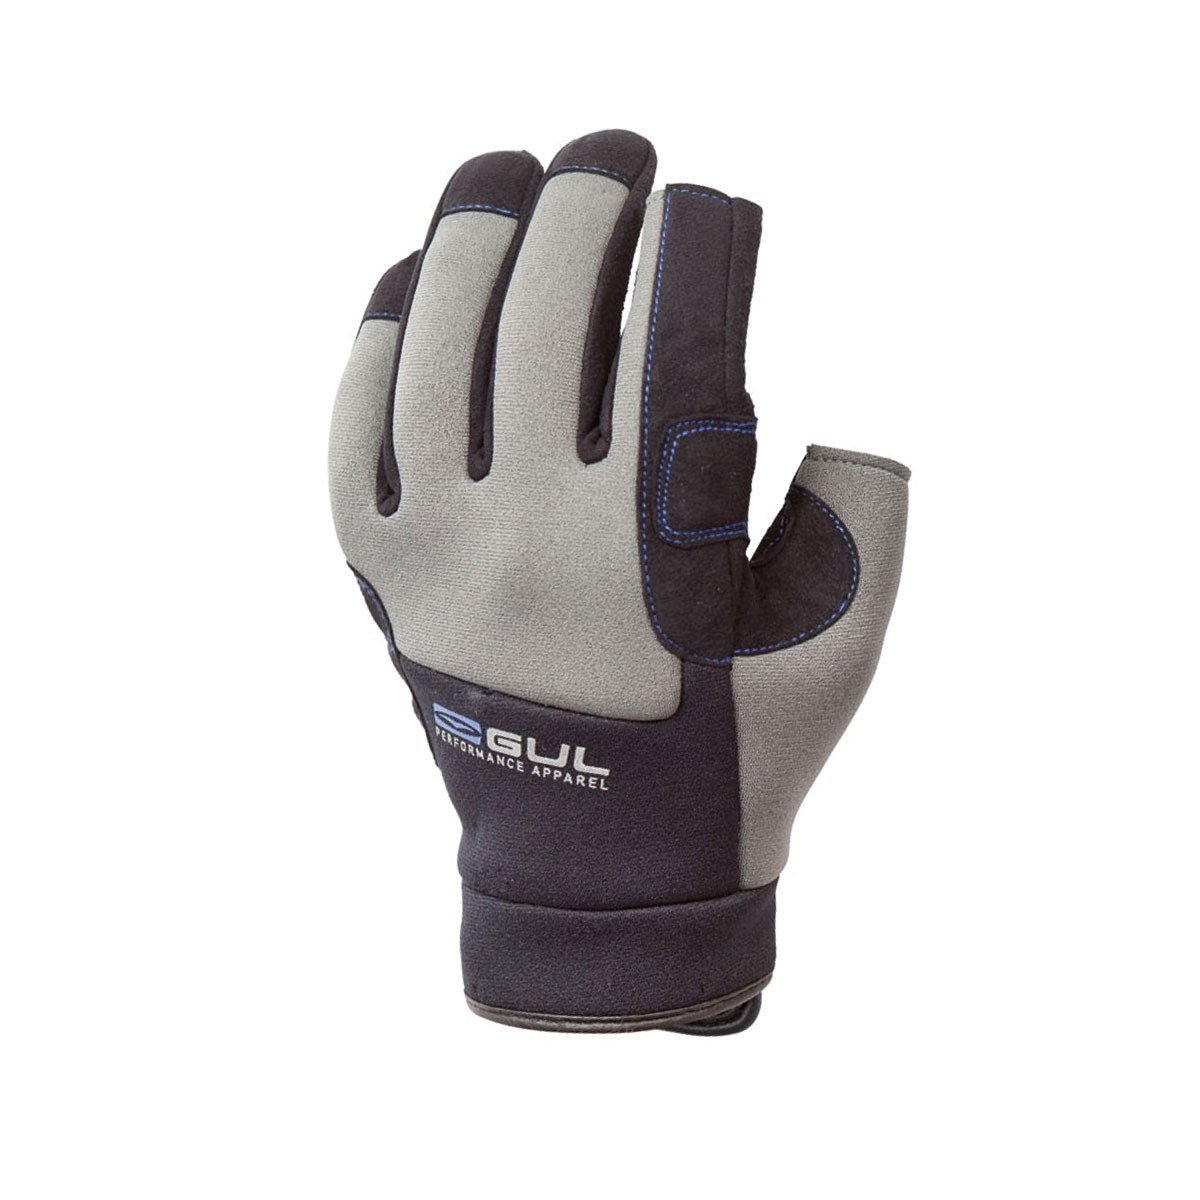 Gul Neoprene Three Finger Winter Sailing Glove   Gl1240-A3